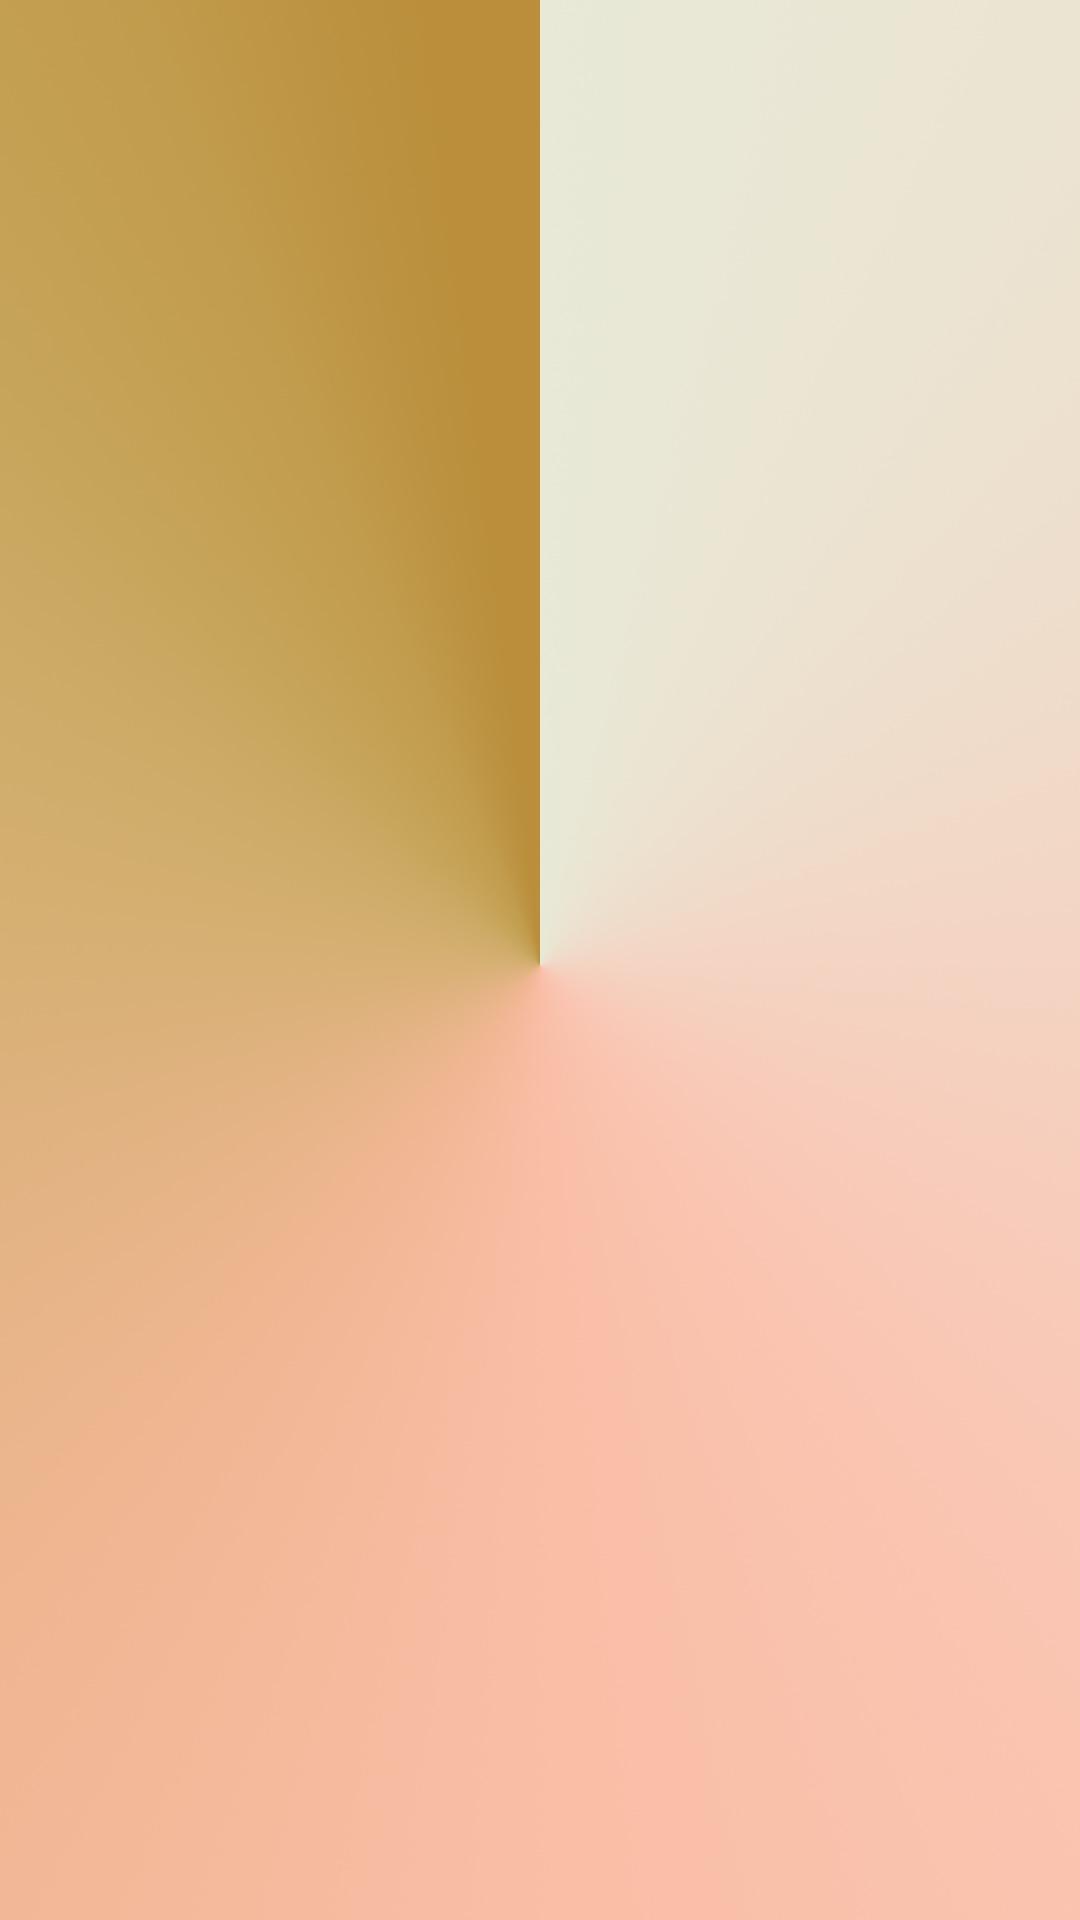 malvina-alves-design-graphique-paris